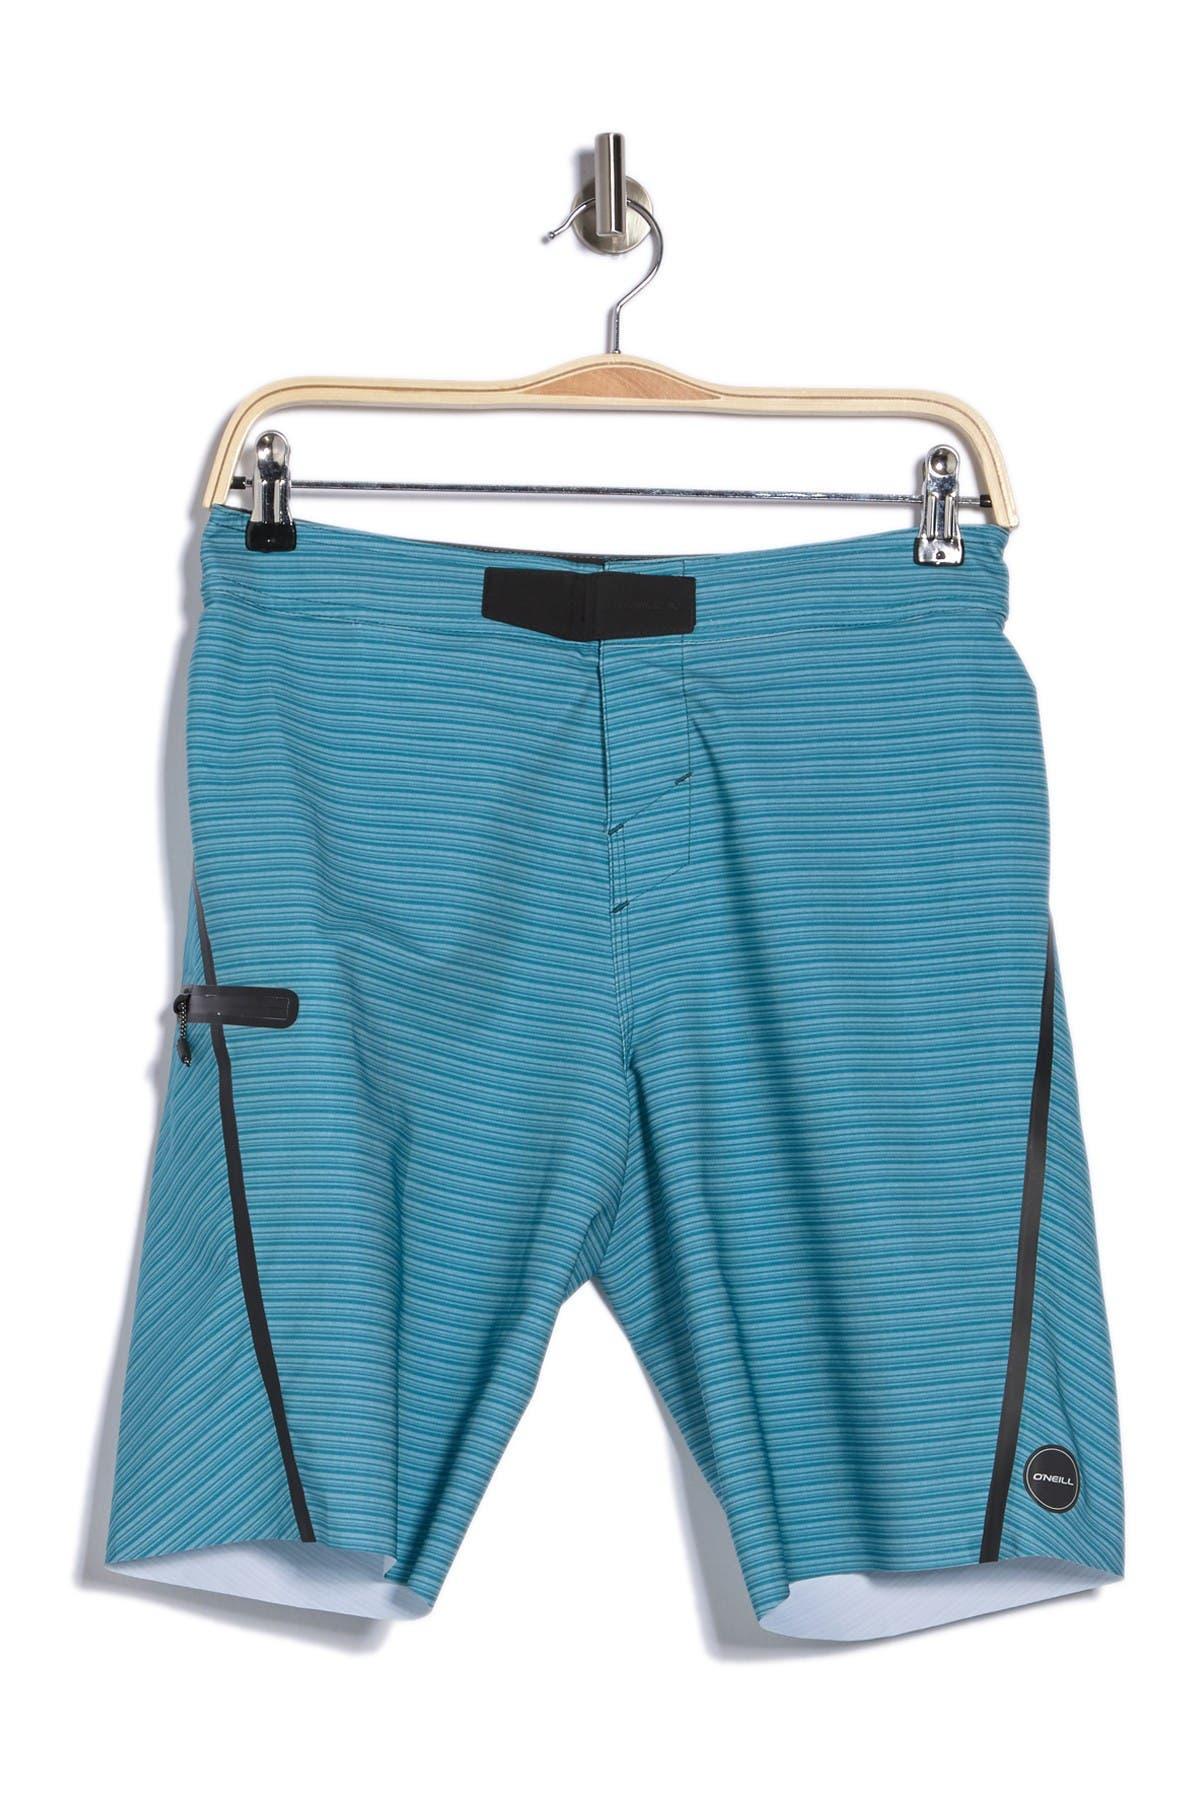 Image of O'Neill Hyperfreak Stripe Boardshorts